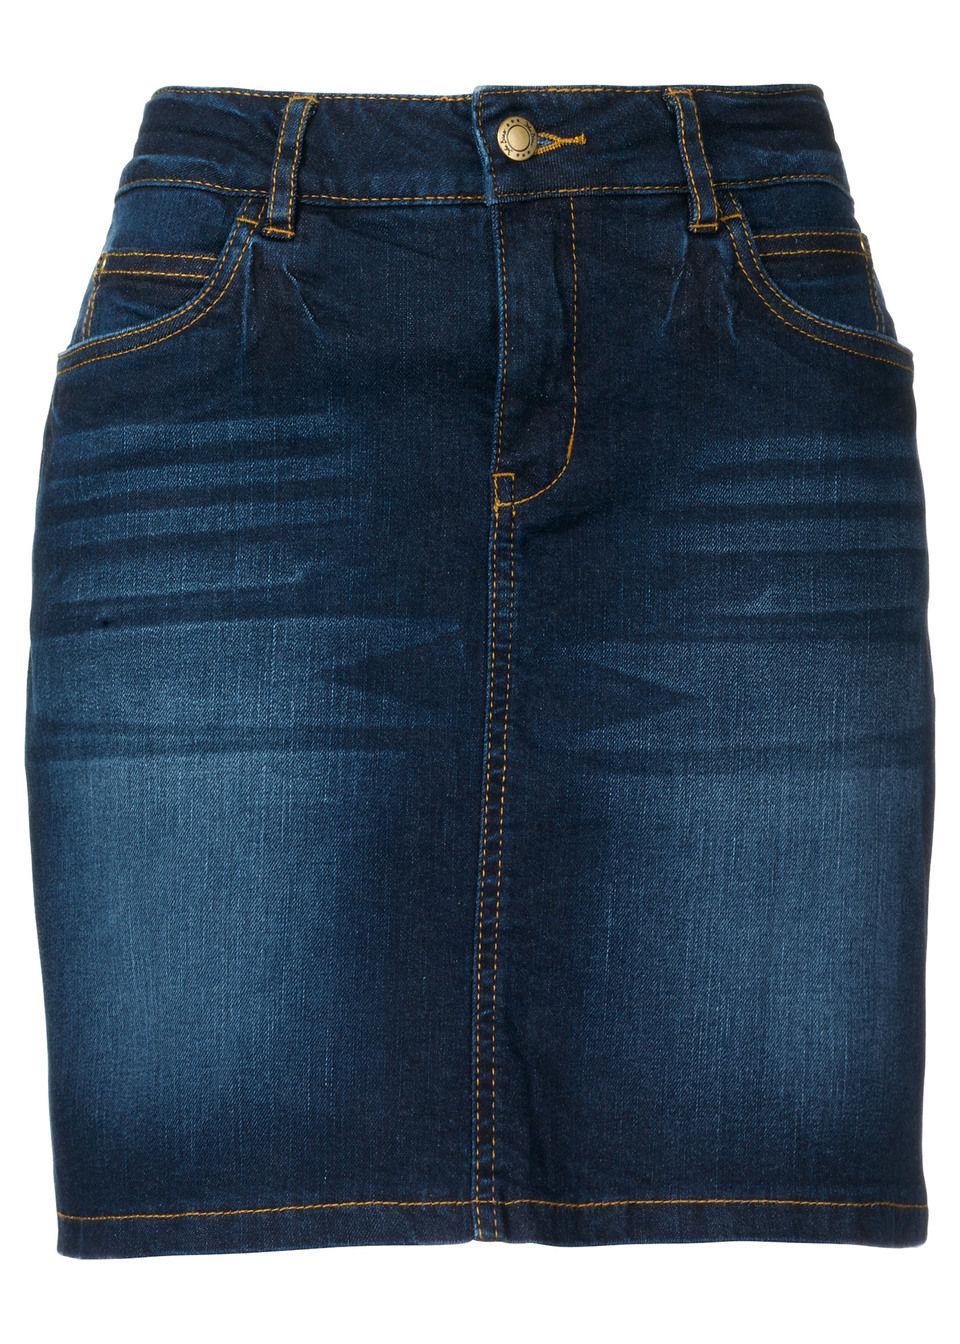 Джинсовая юбка-стретч от bonprix